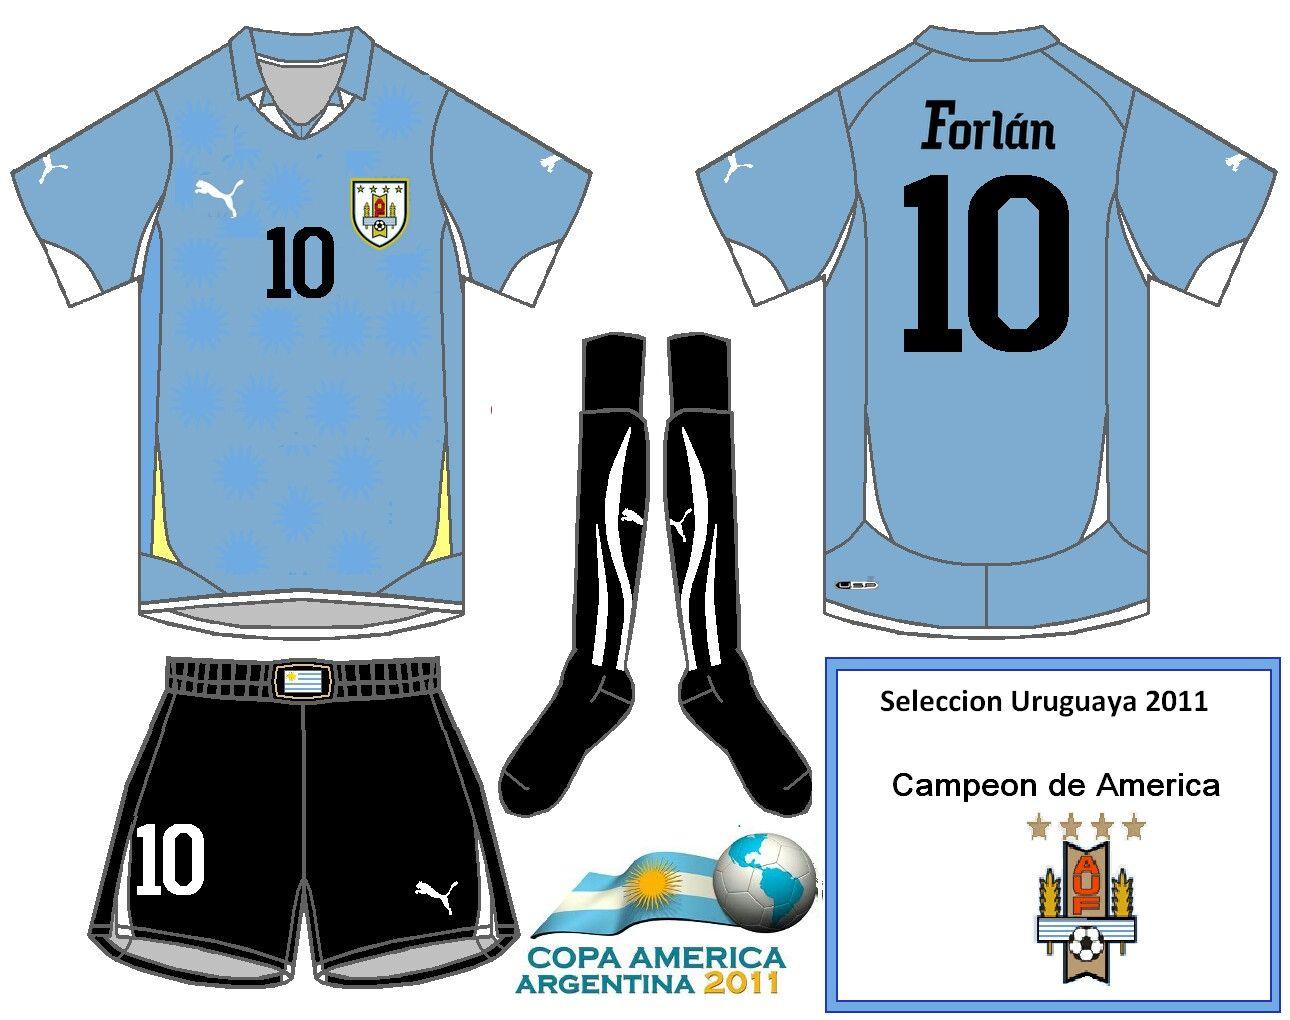 e7f04a31860 Uruguay home shirt for the 2011 Copa America. Football Fashion, Uruguay